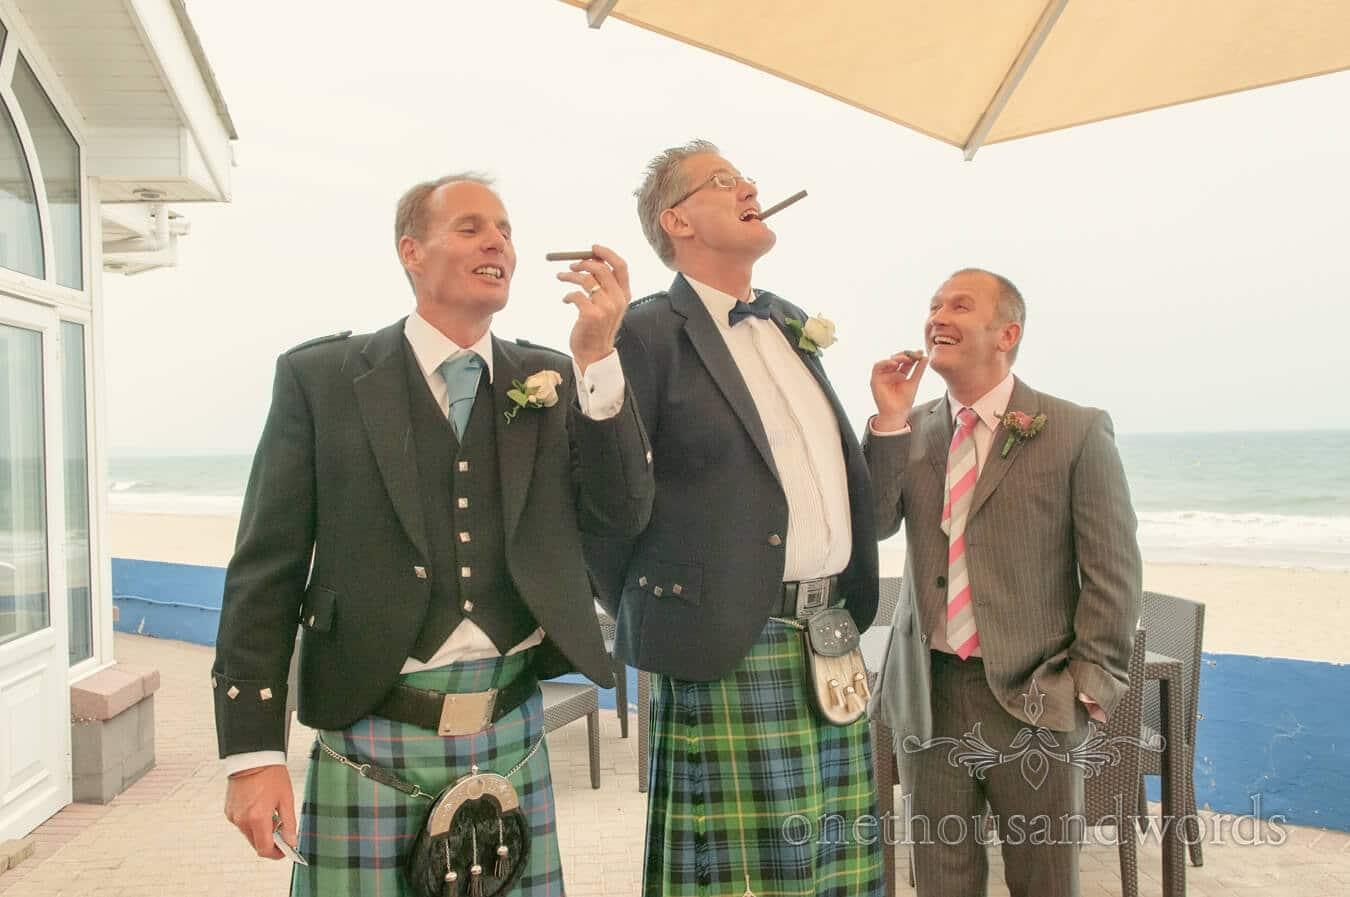 Groom and groomsmen in kits smoke cigars by the sea